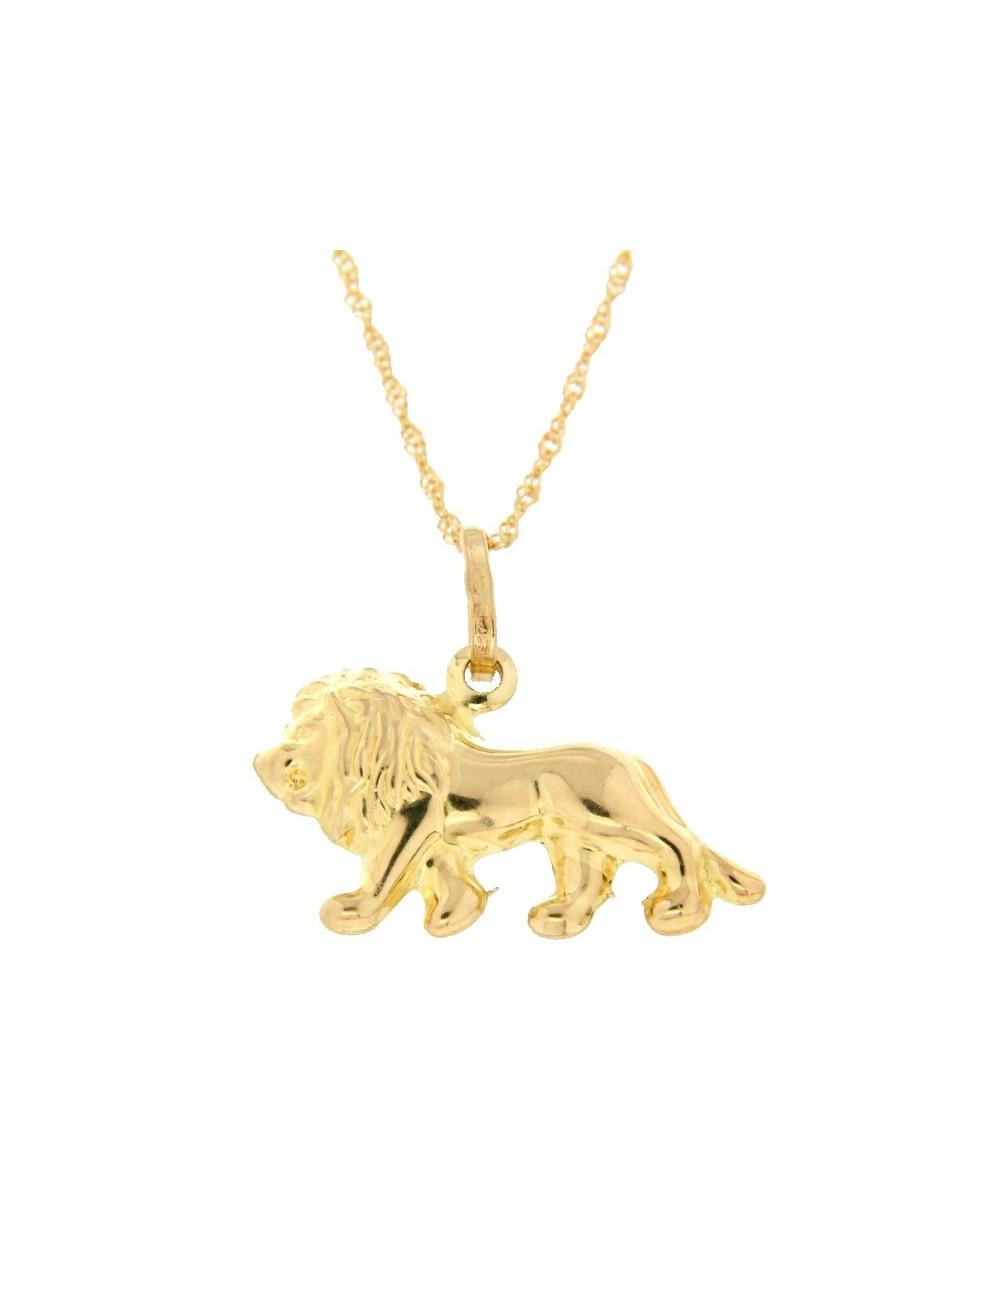 Pendentif Lion Or Jaune 18 Carats + chaine